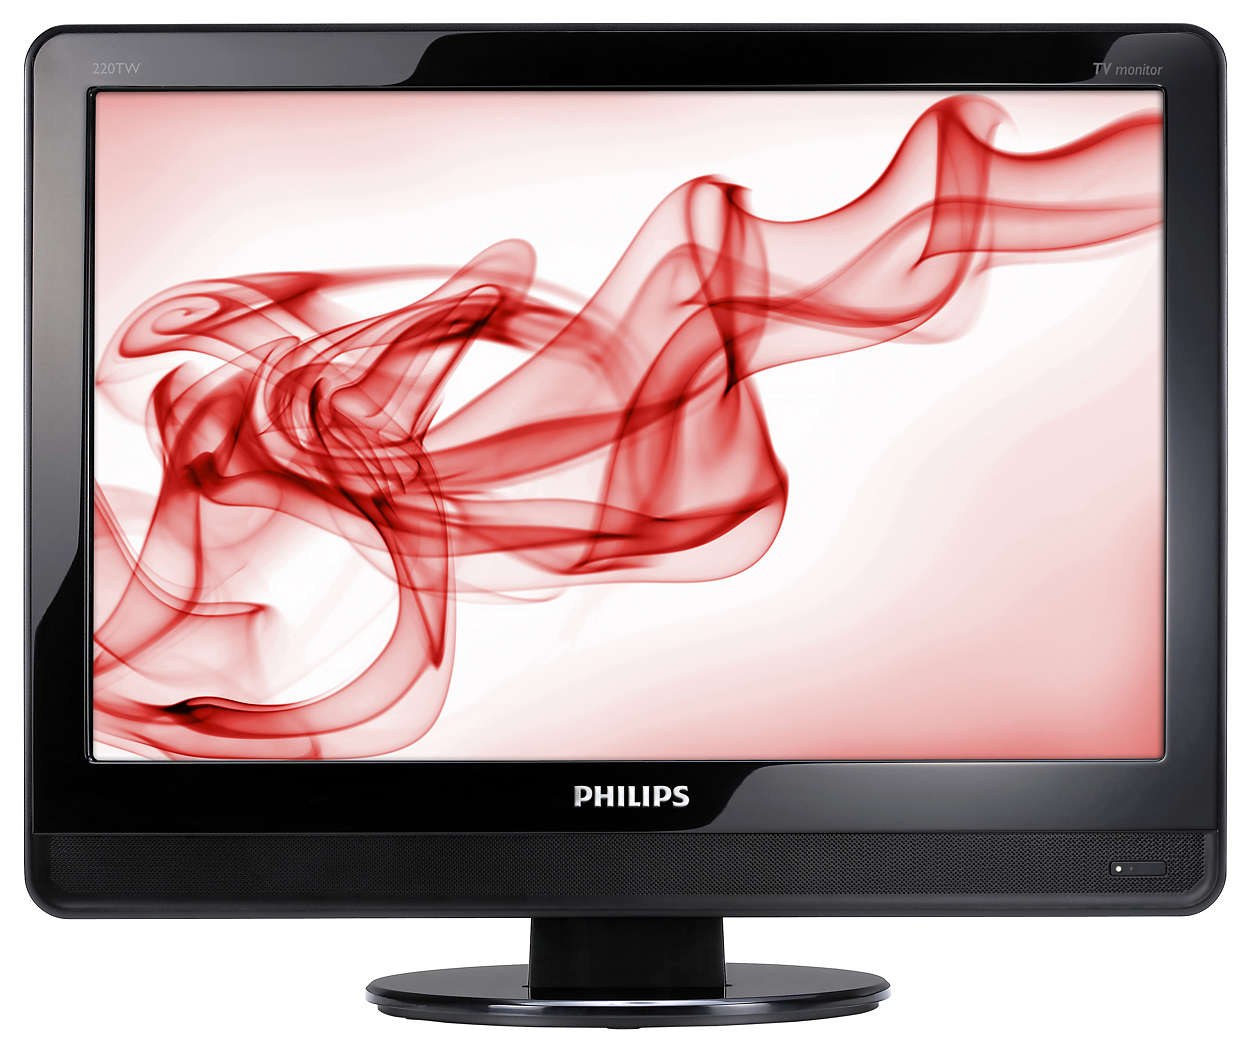 Digital HD-TV monitor in a stylish package